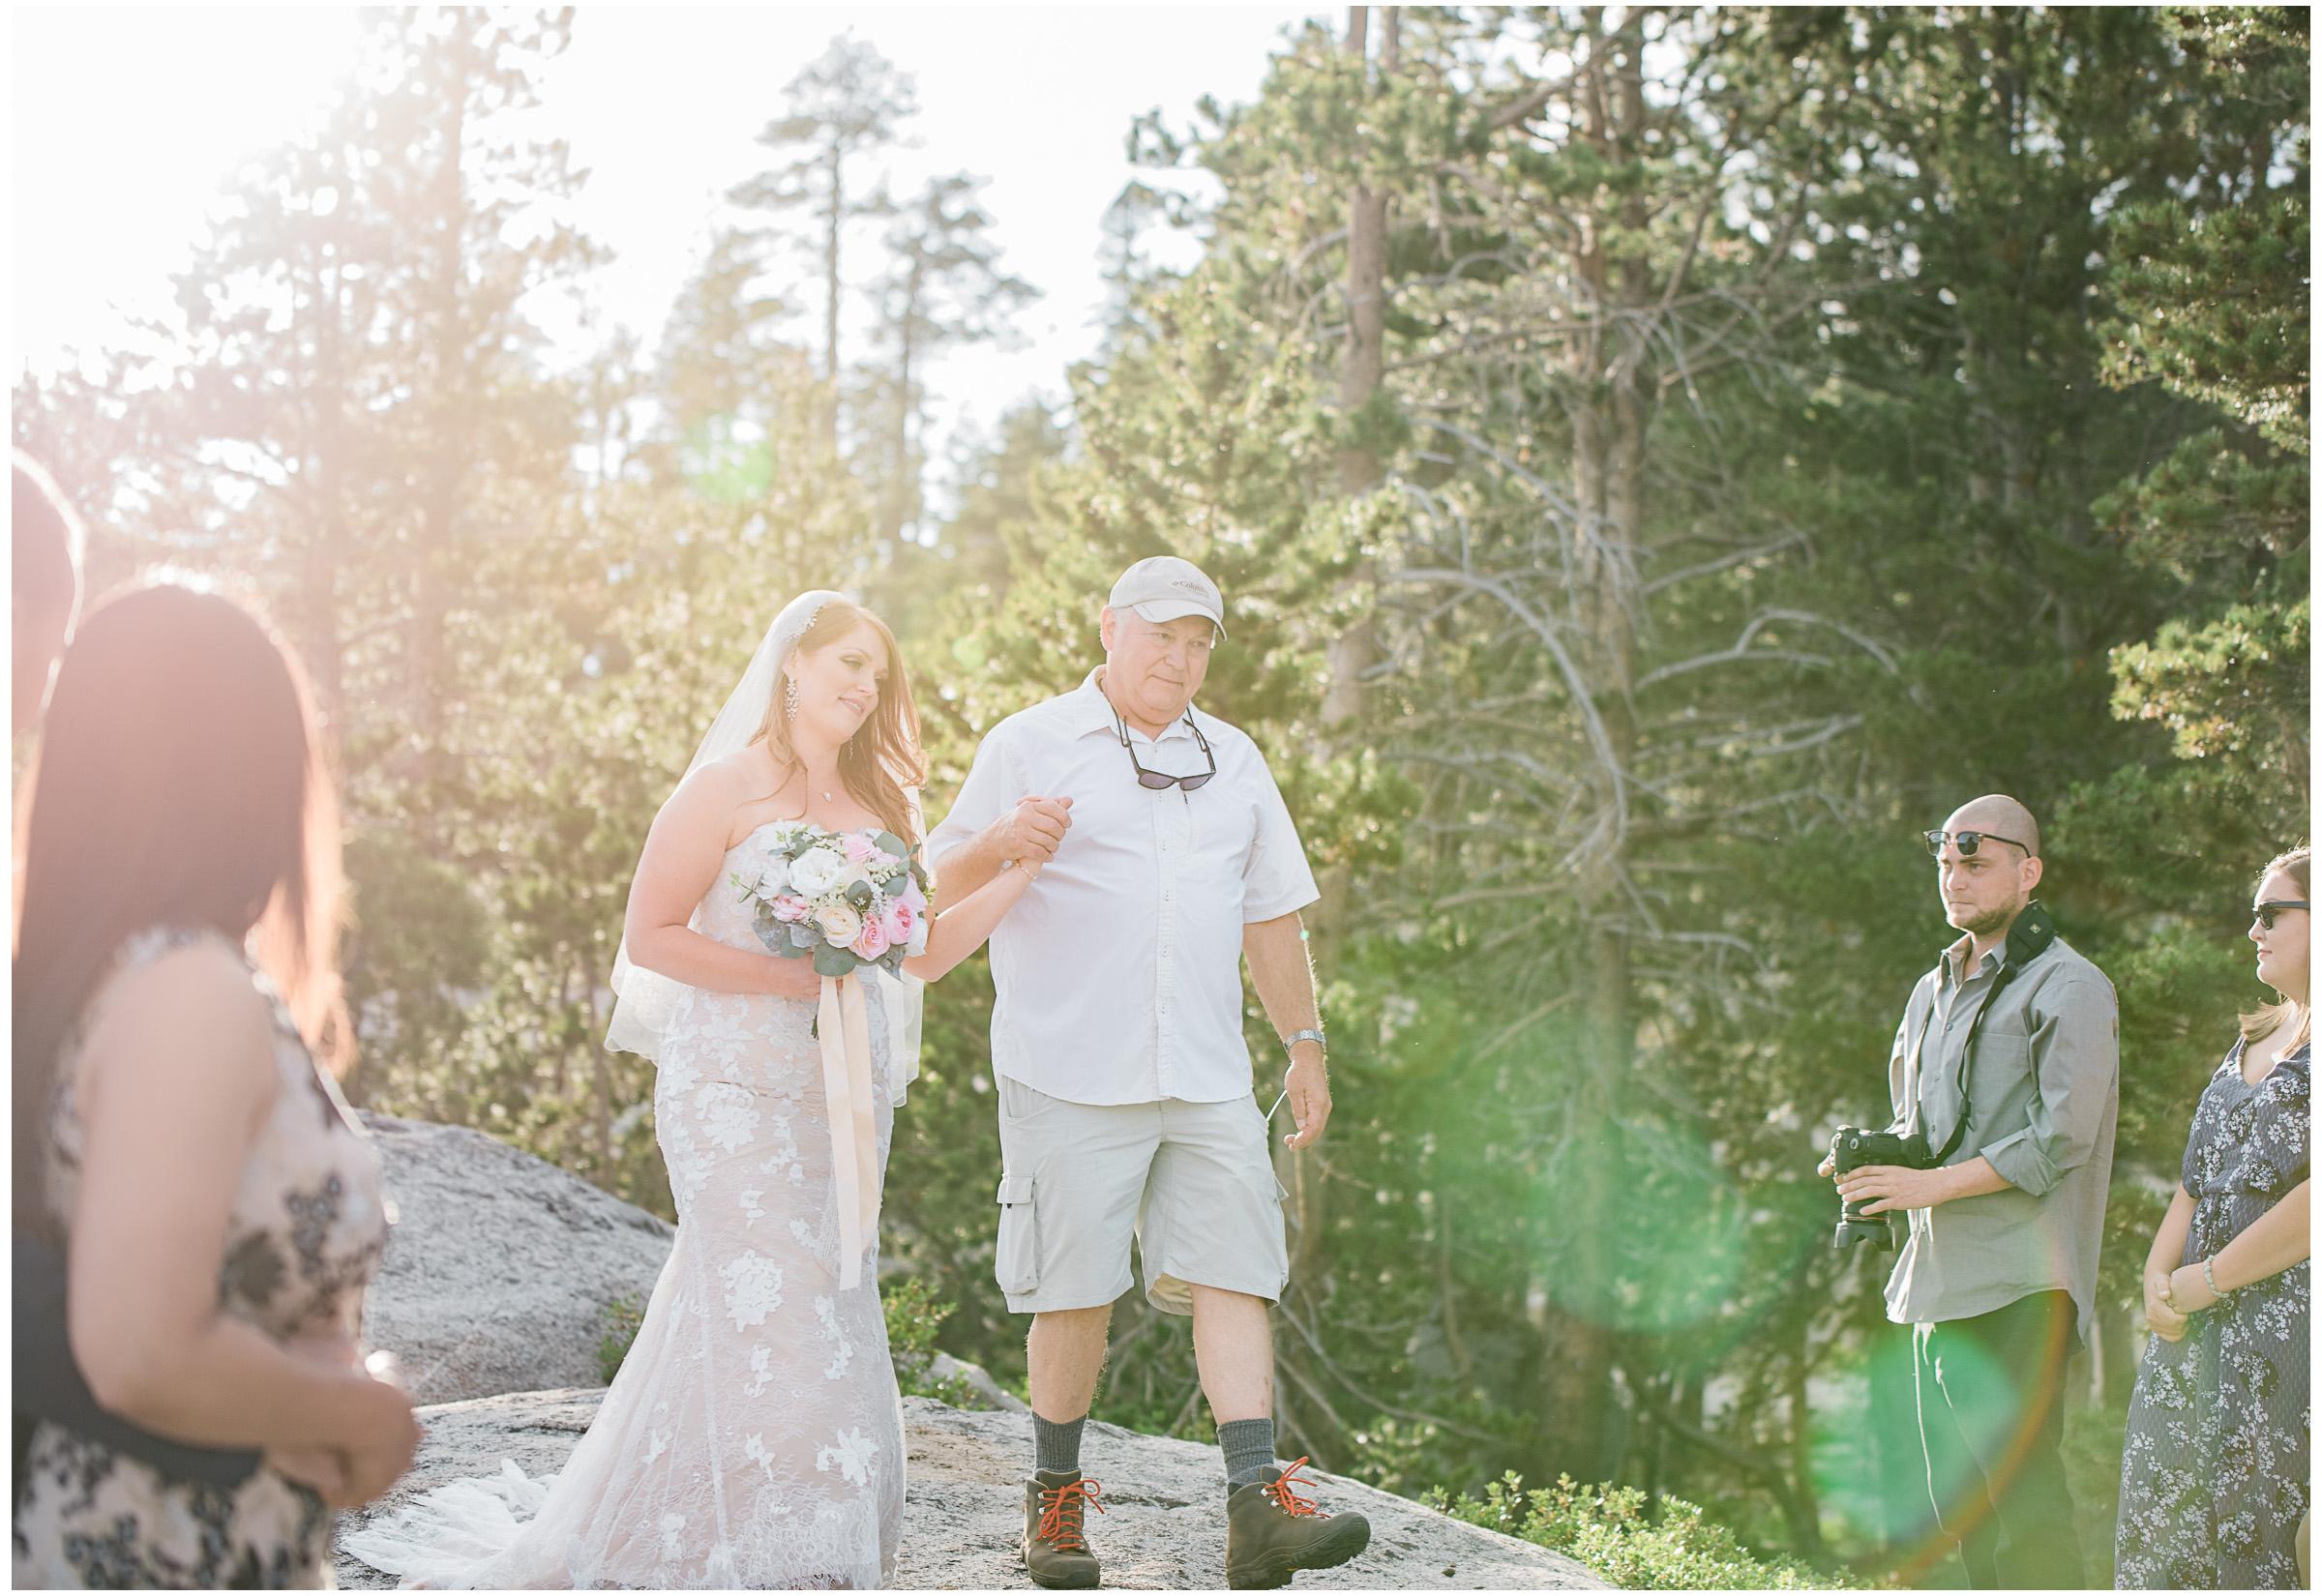 Clarksburg Wedding - Sacramento Photographer - Bogle Winery - Justin Wilcox Photography - 6.jpg